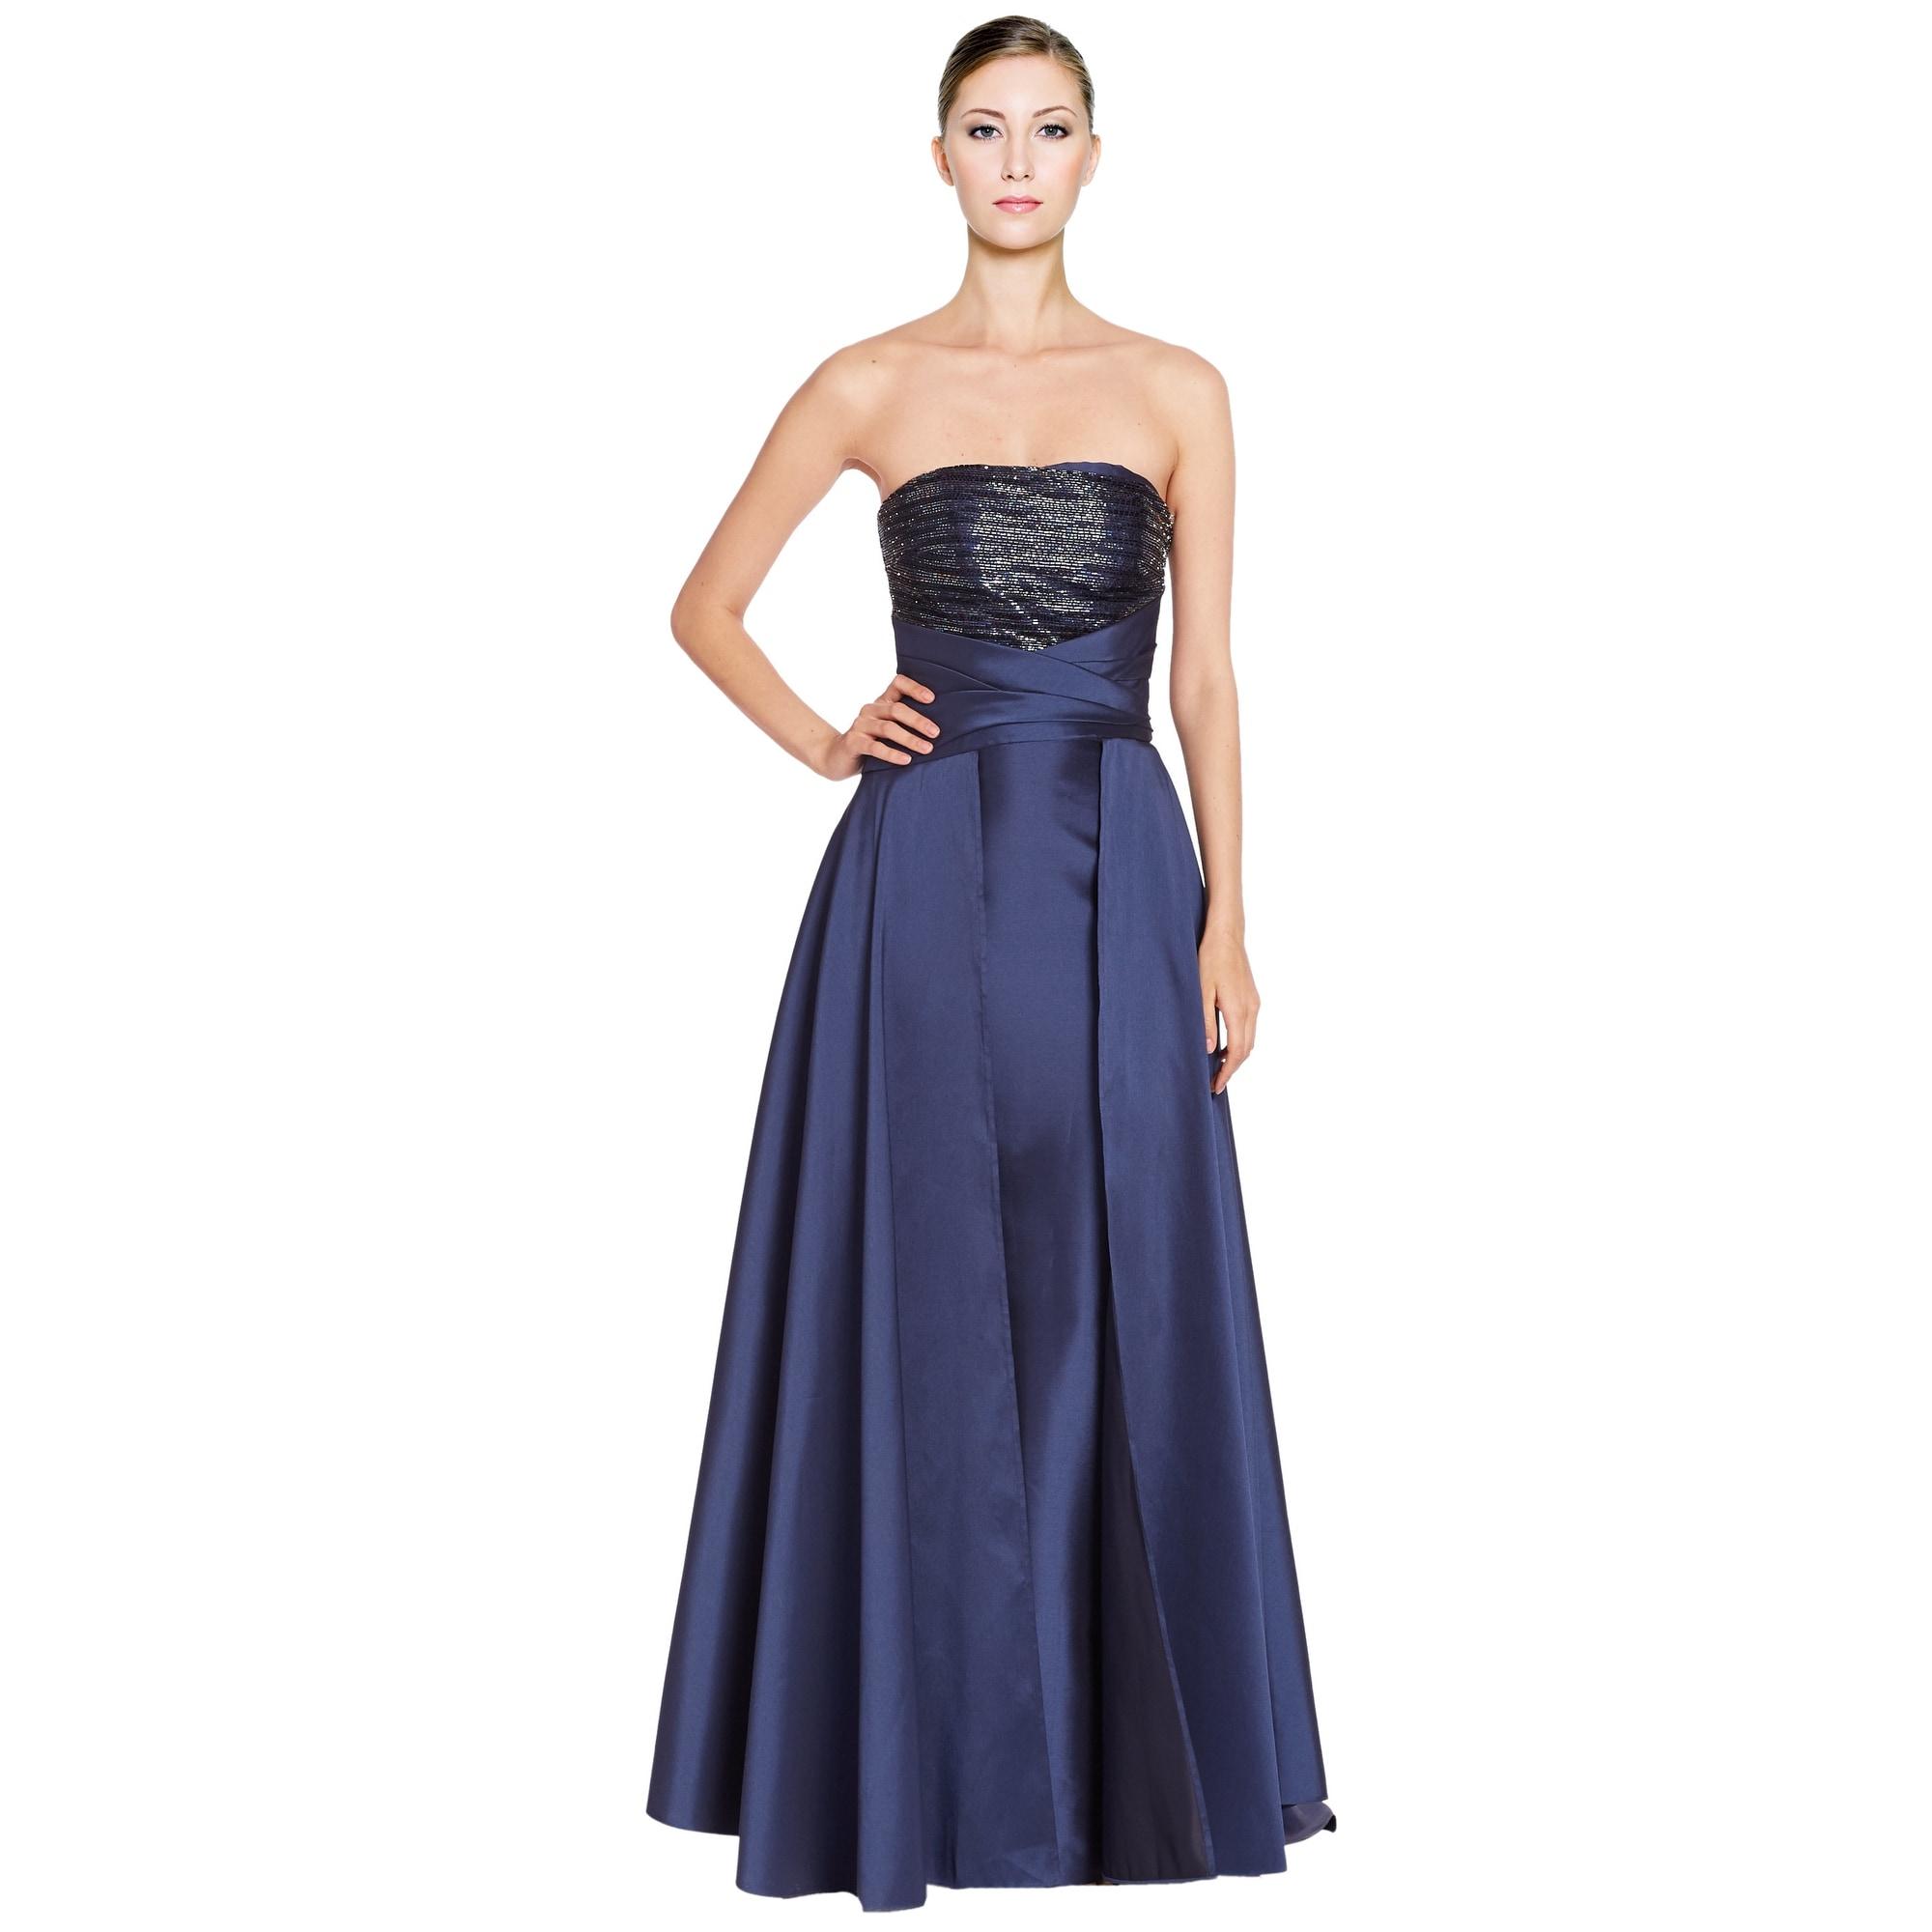 29+ Pamella Roland Blue Dress Gif